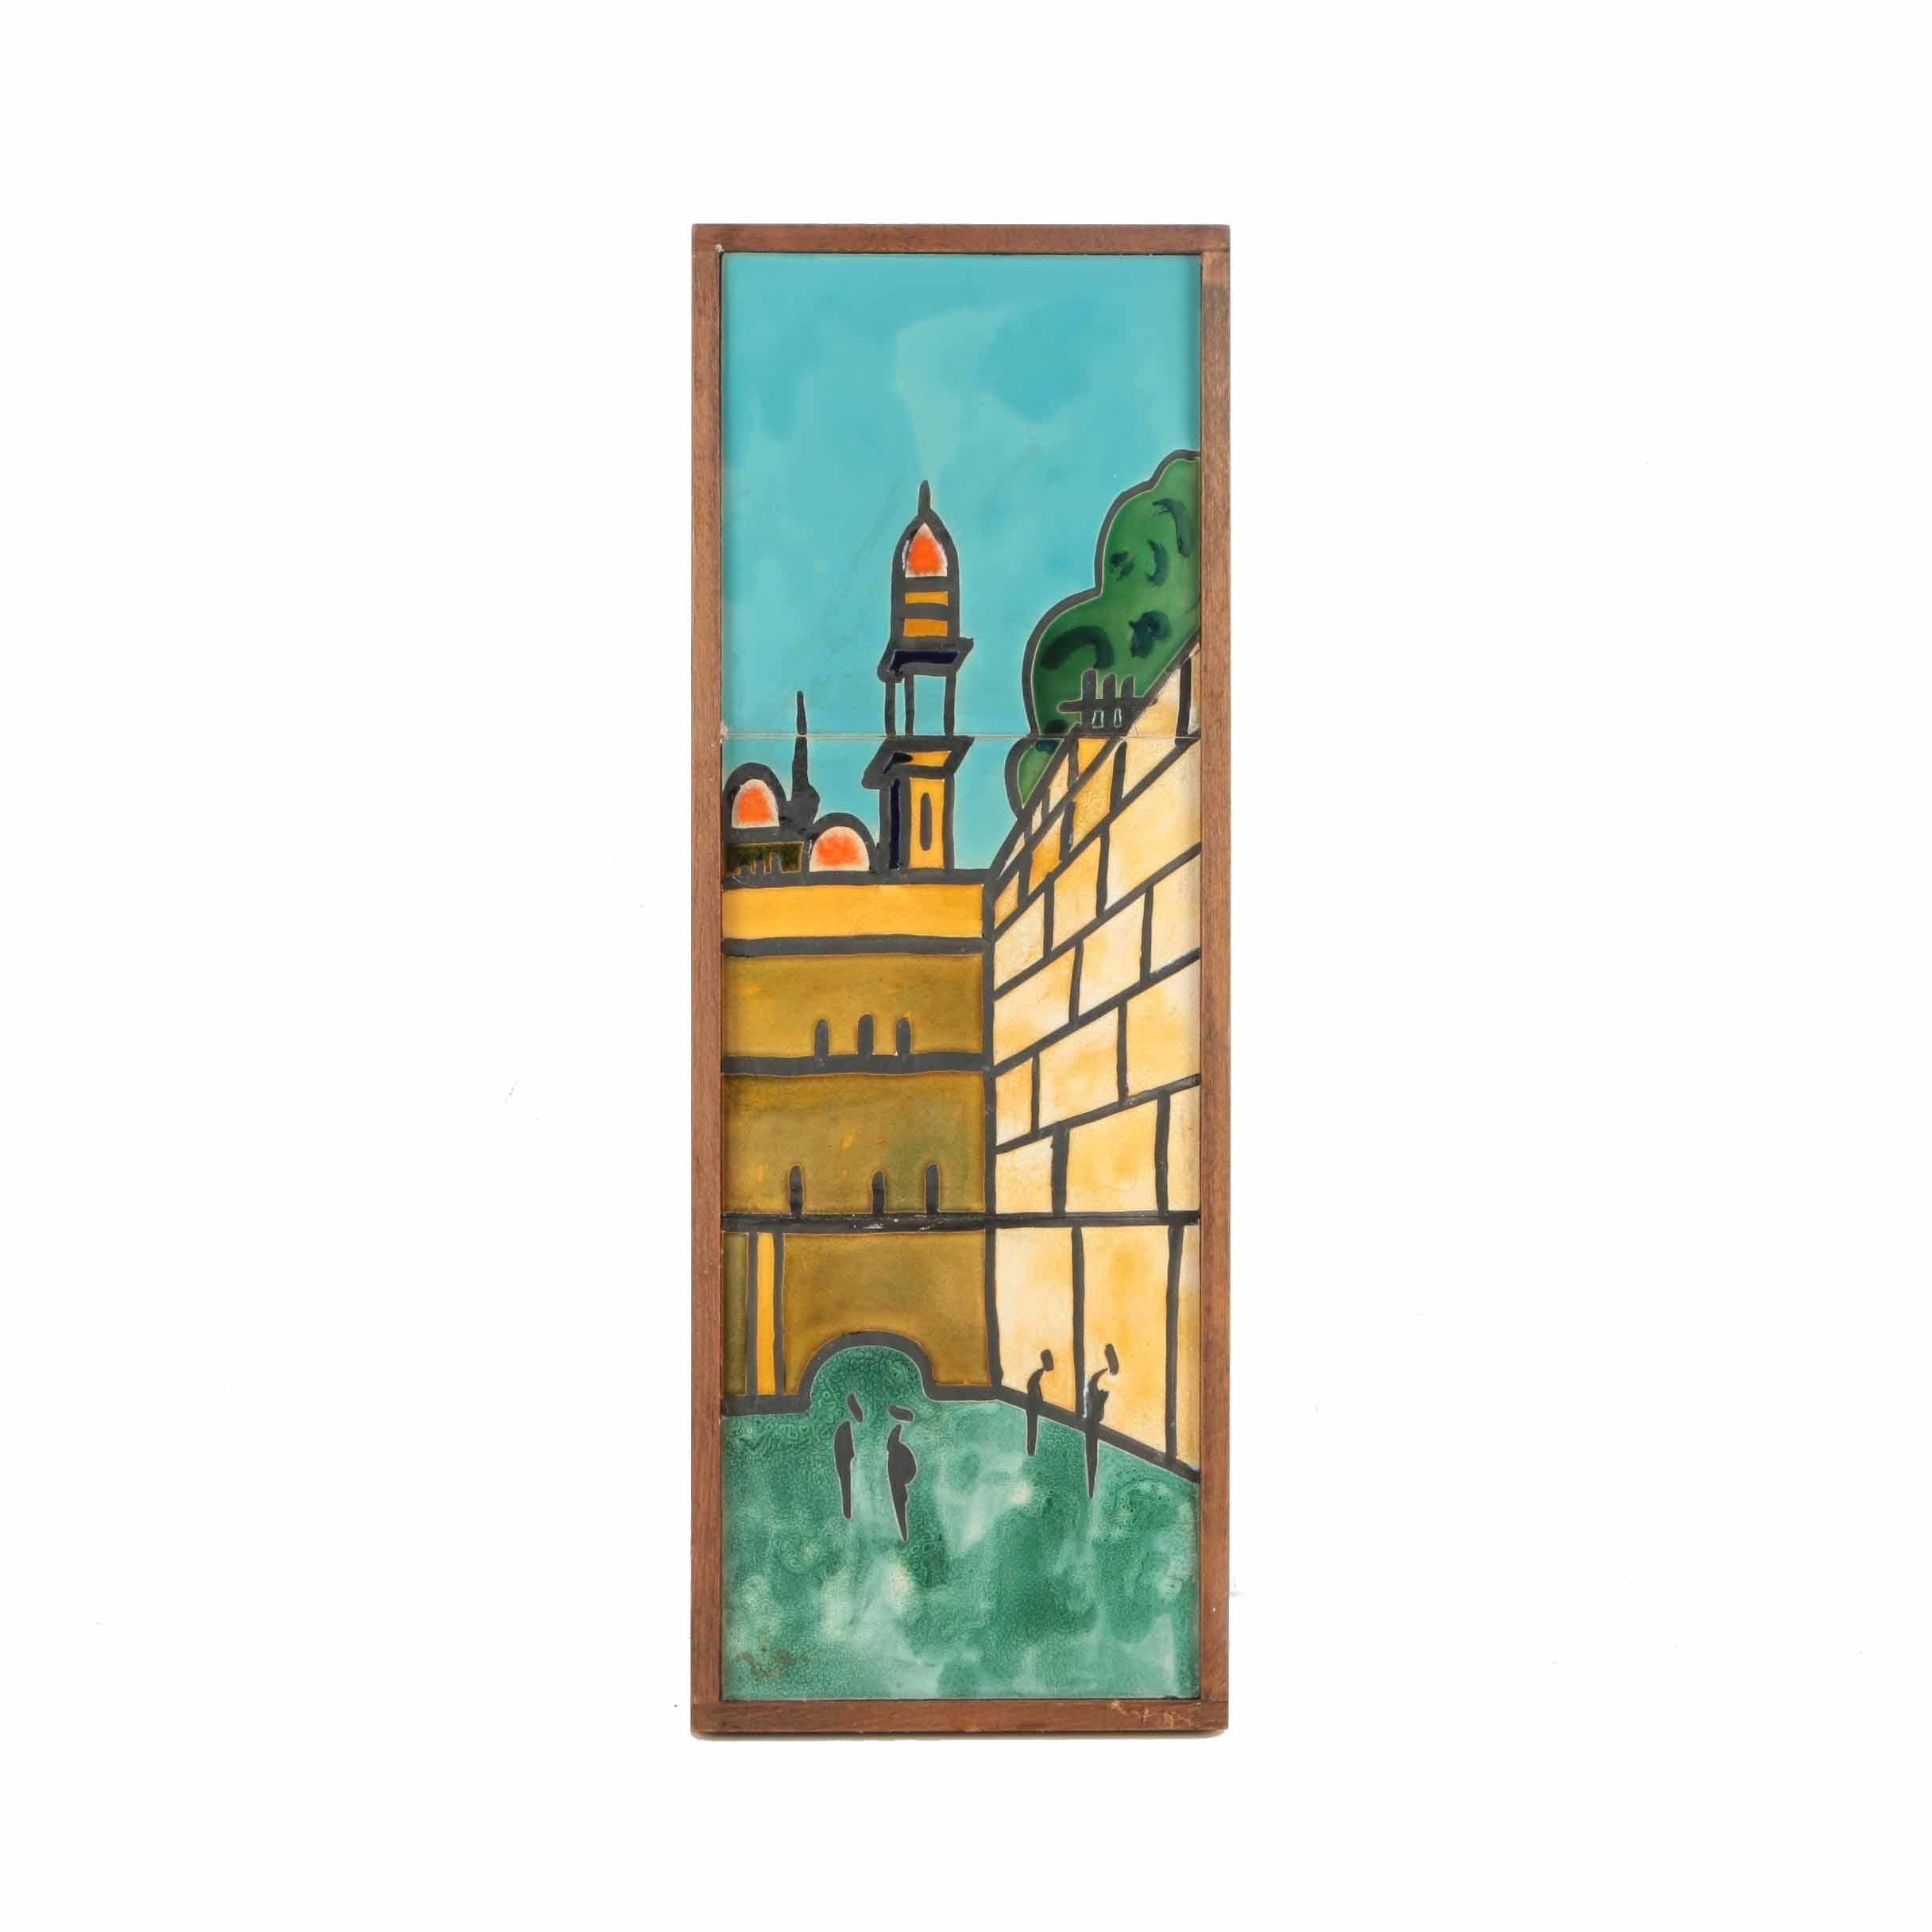 Ein-Reb Art Ceramic Plaque of the Western Wall in Jerusalem